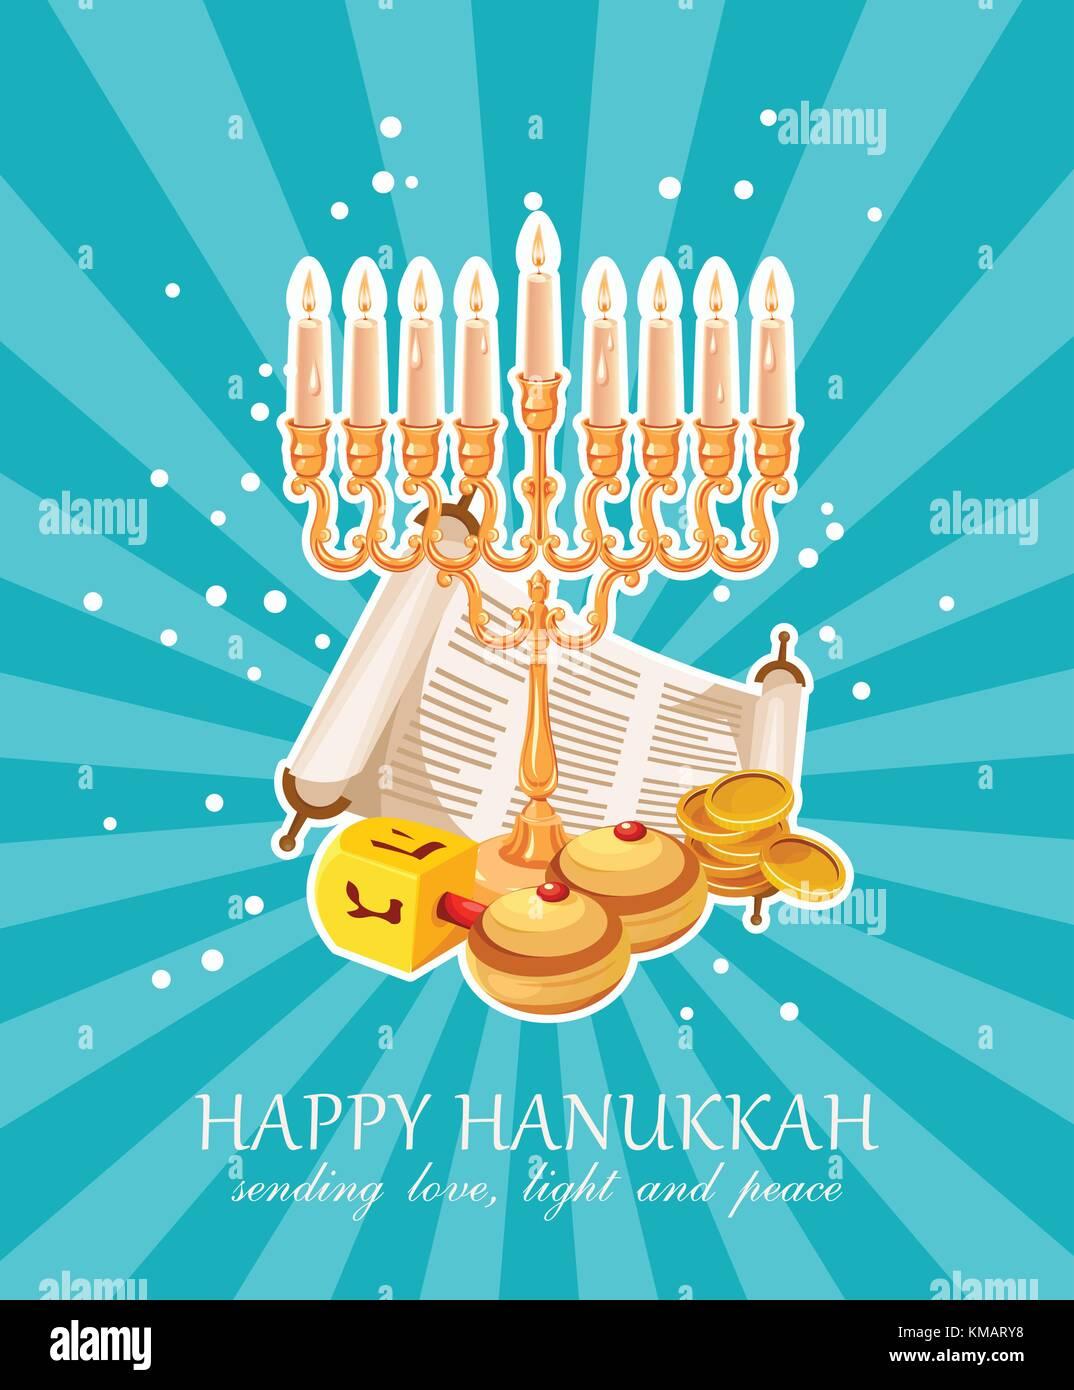 Happy hanukkah vector greeting card in modern style stock vector art happy hanukkah vector greeting card in modern style m4hsunfo